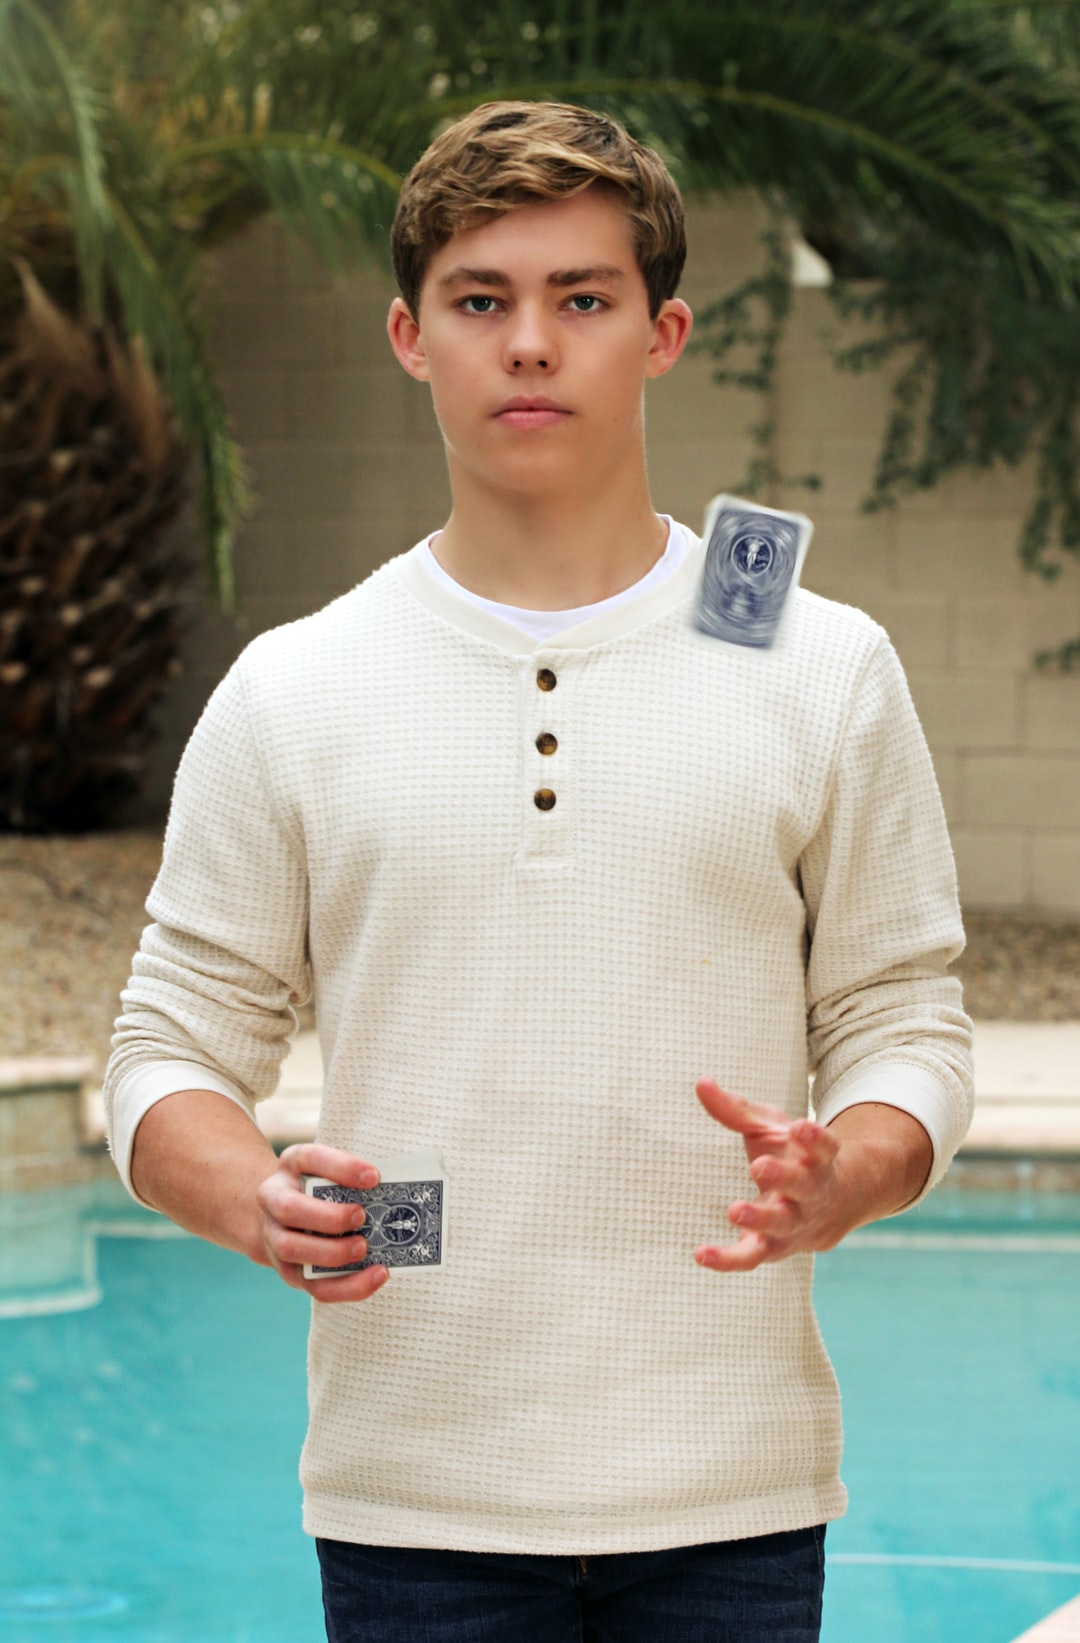 A boy juggles blue cards.